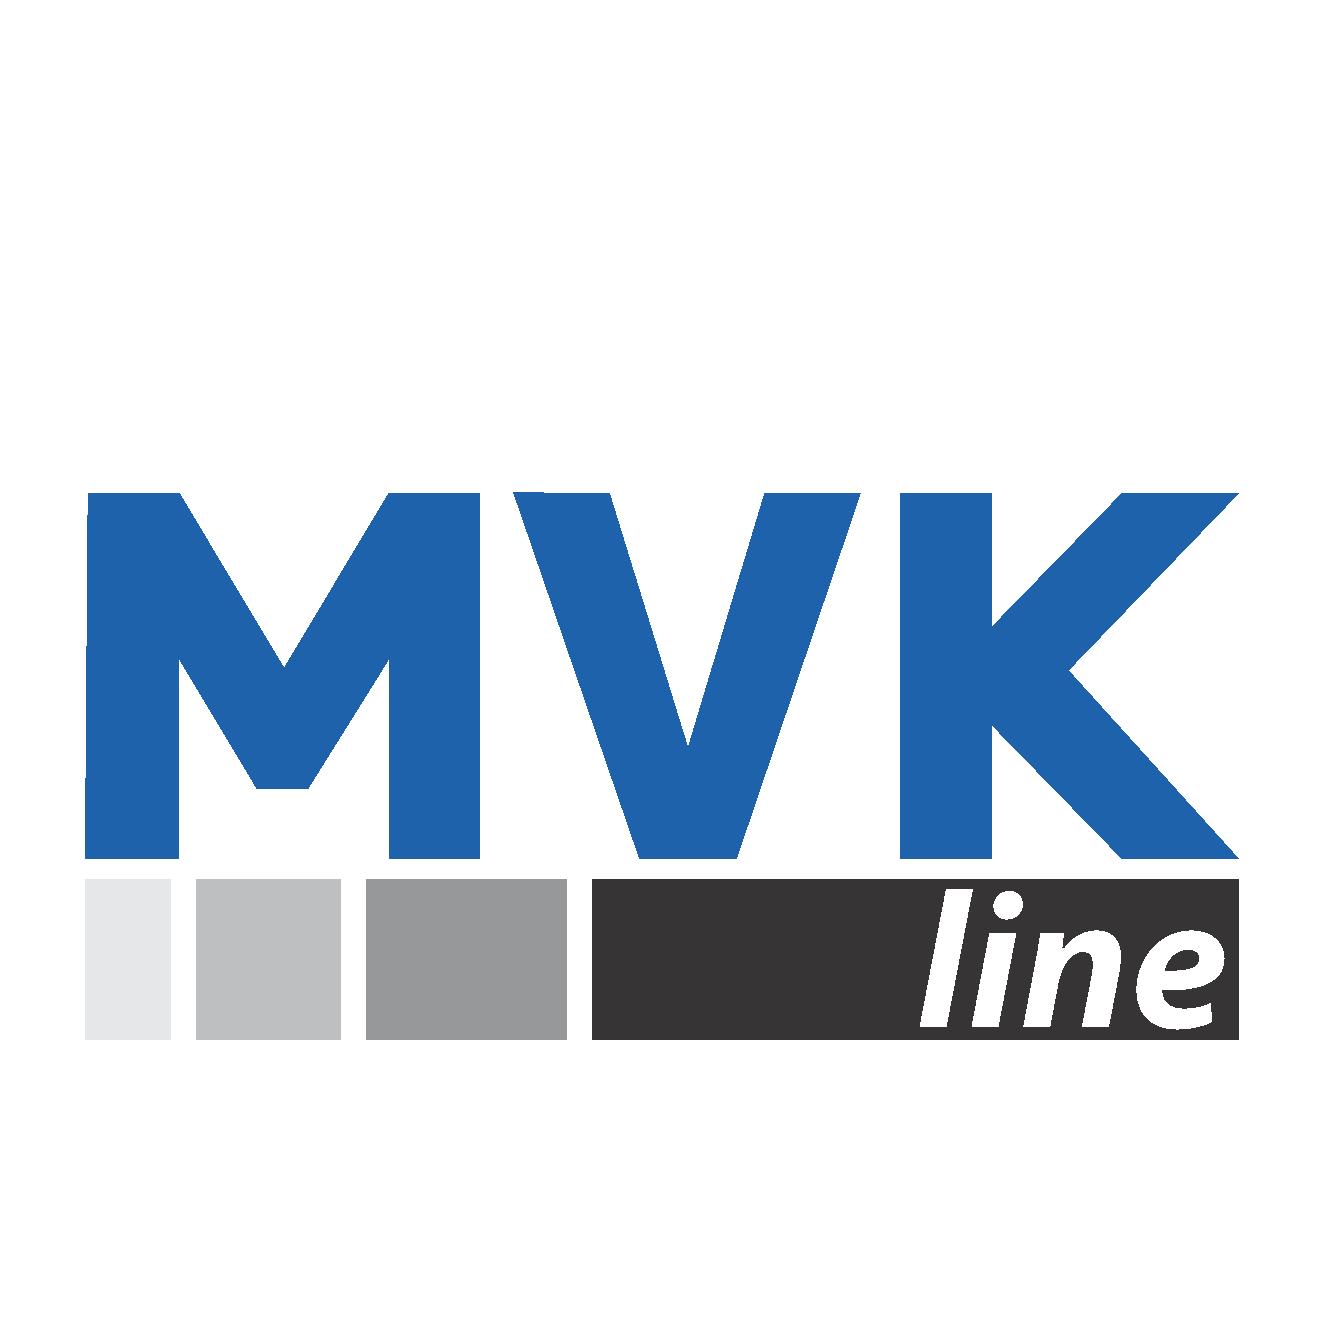 MVK-line.png